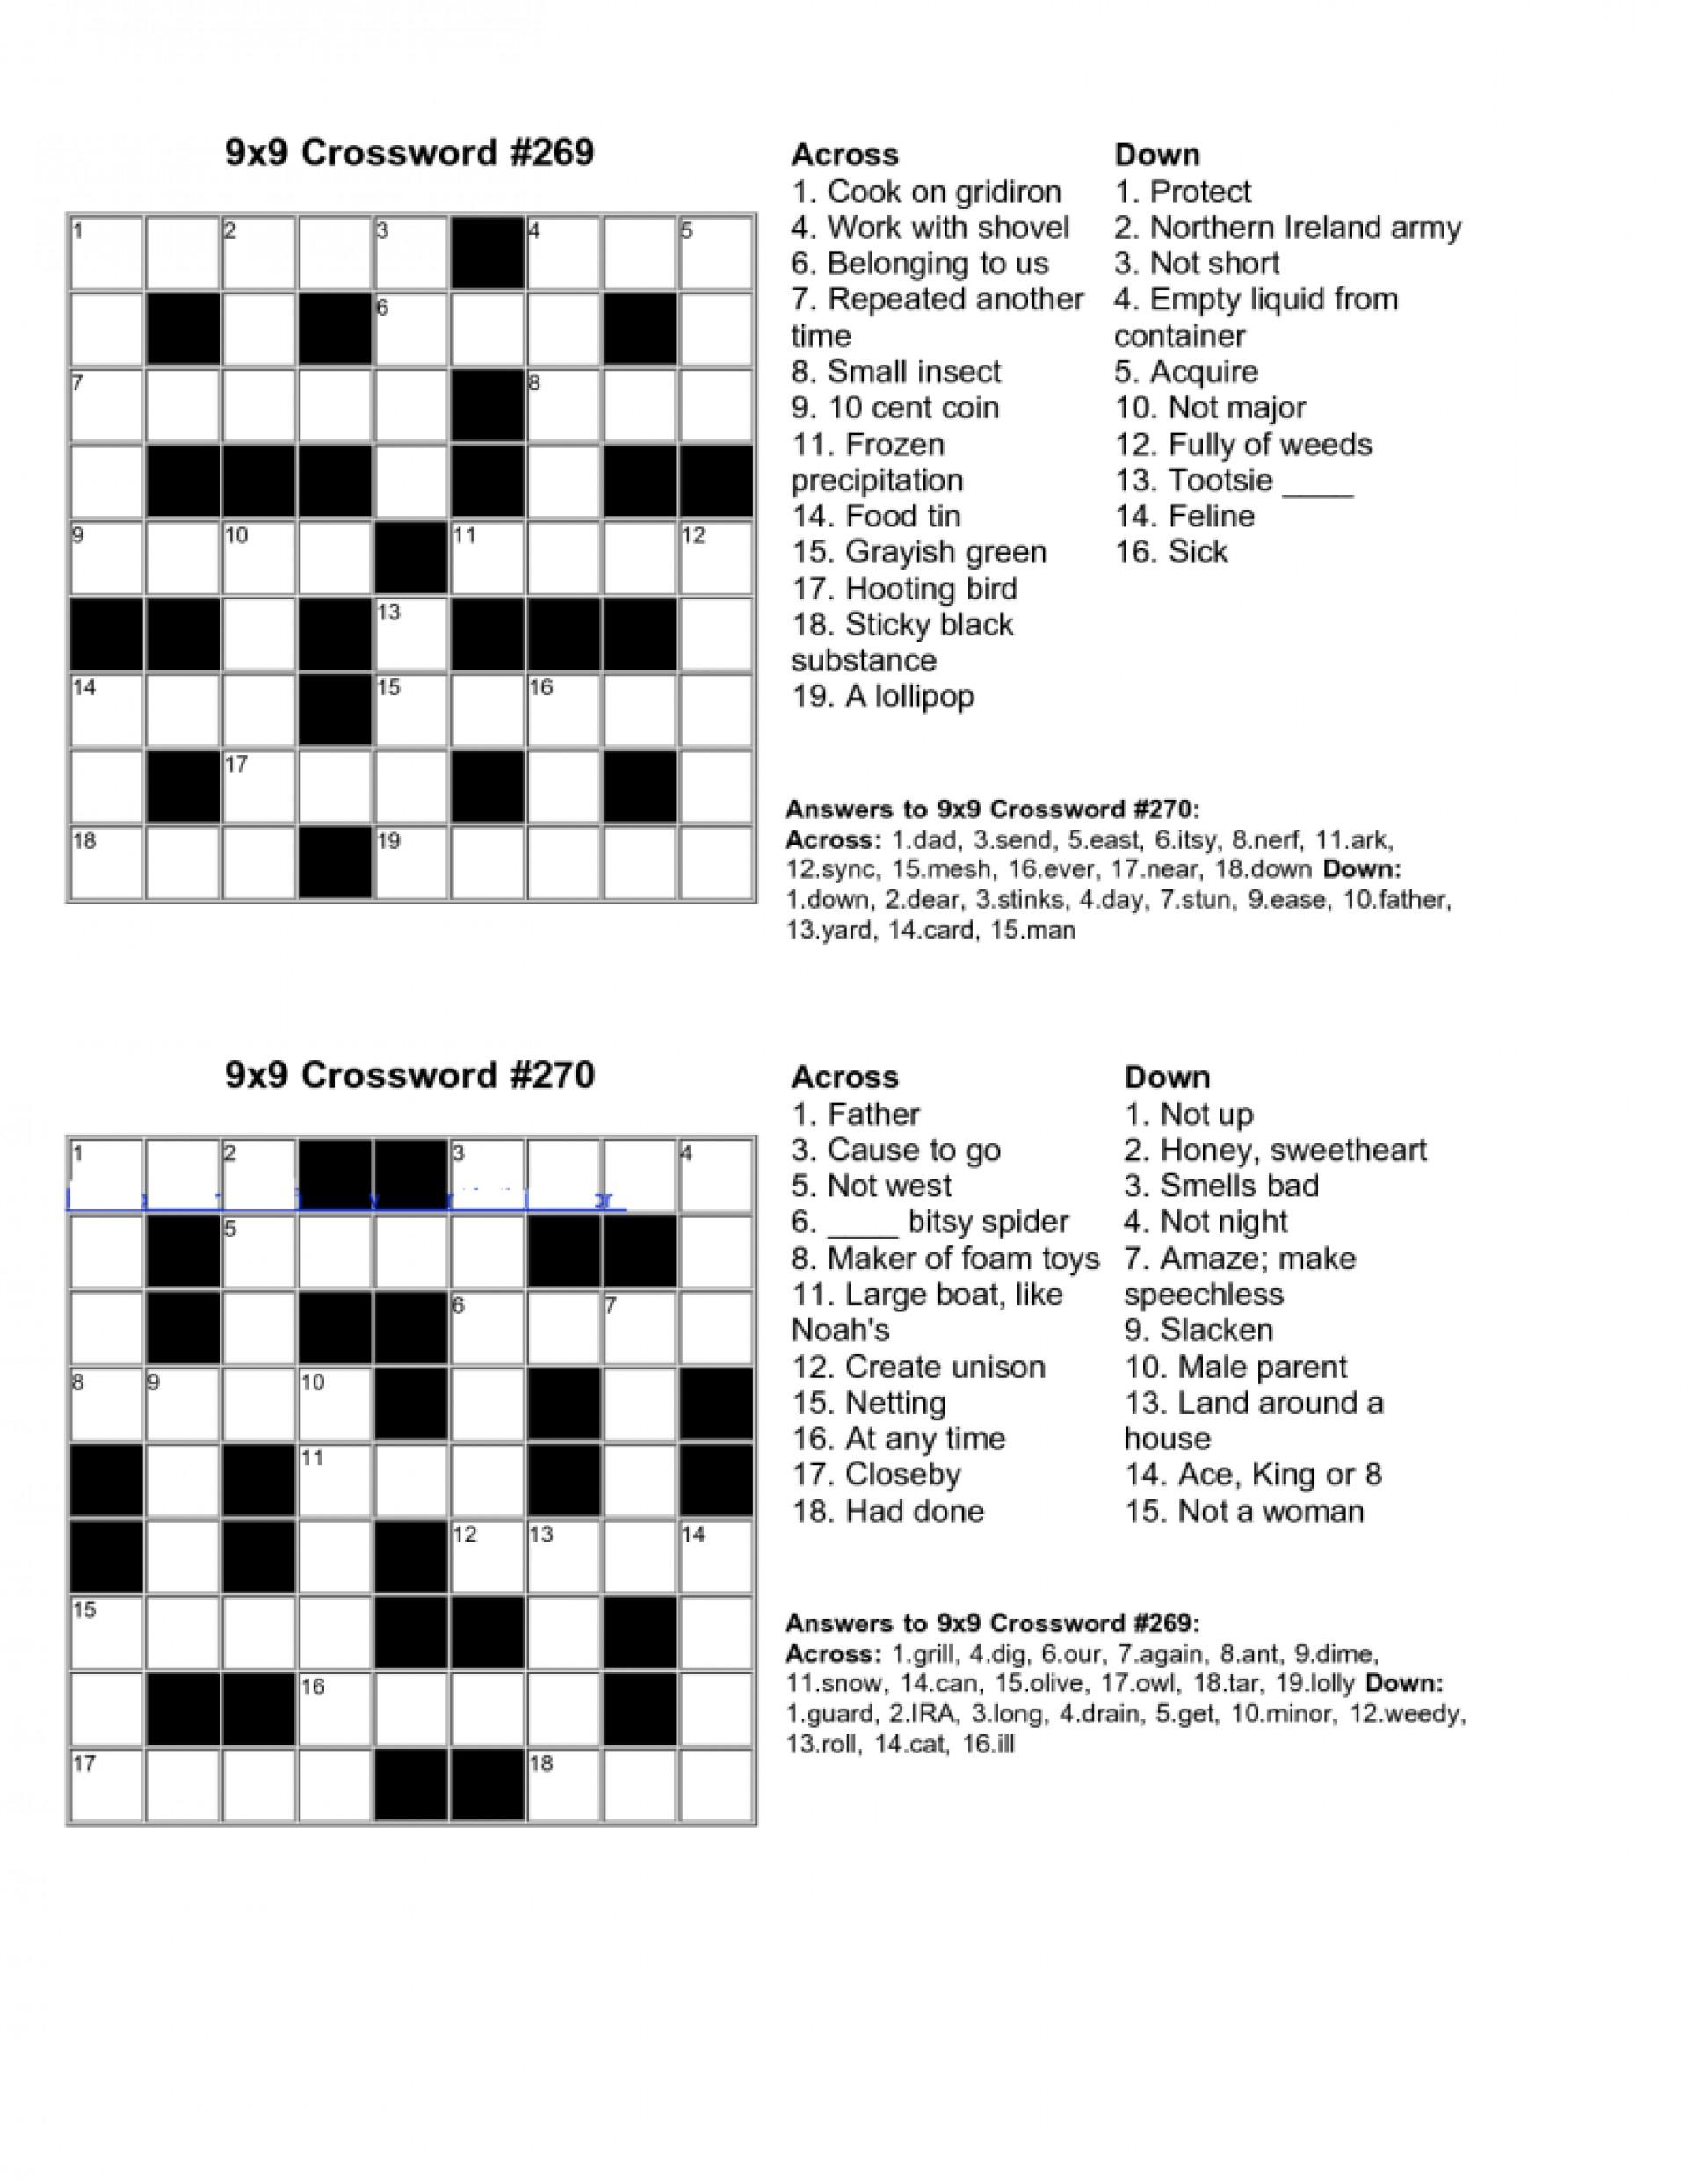 Free Crossword Puzzle Maker Printable - Stepindance.fr - Create A - Create Your Own Crossword Puzzle Free Printable